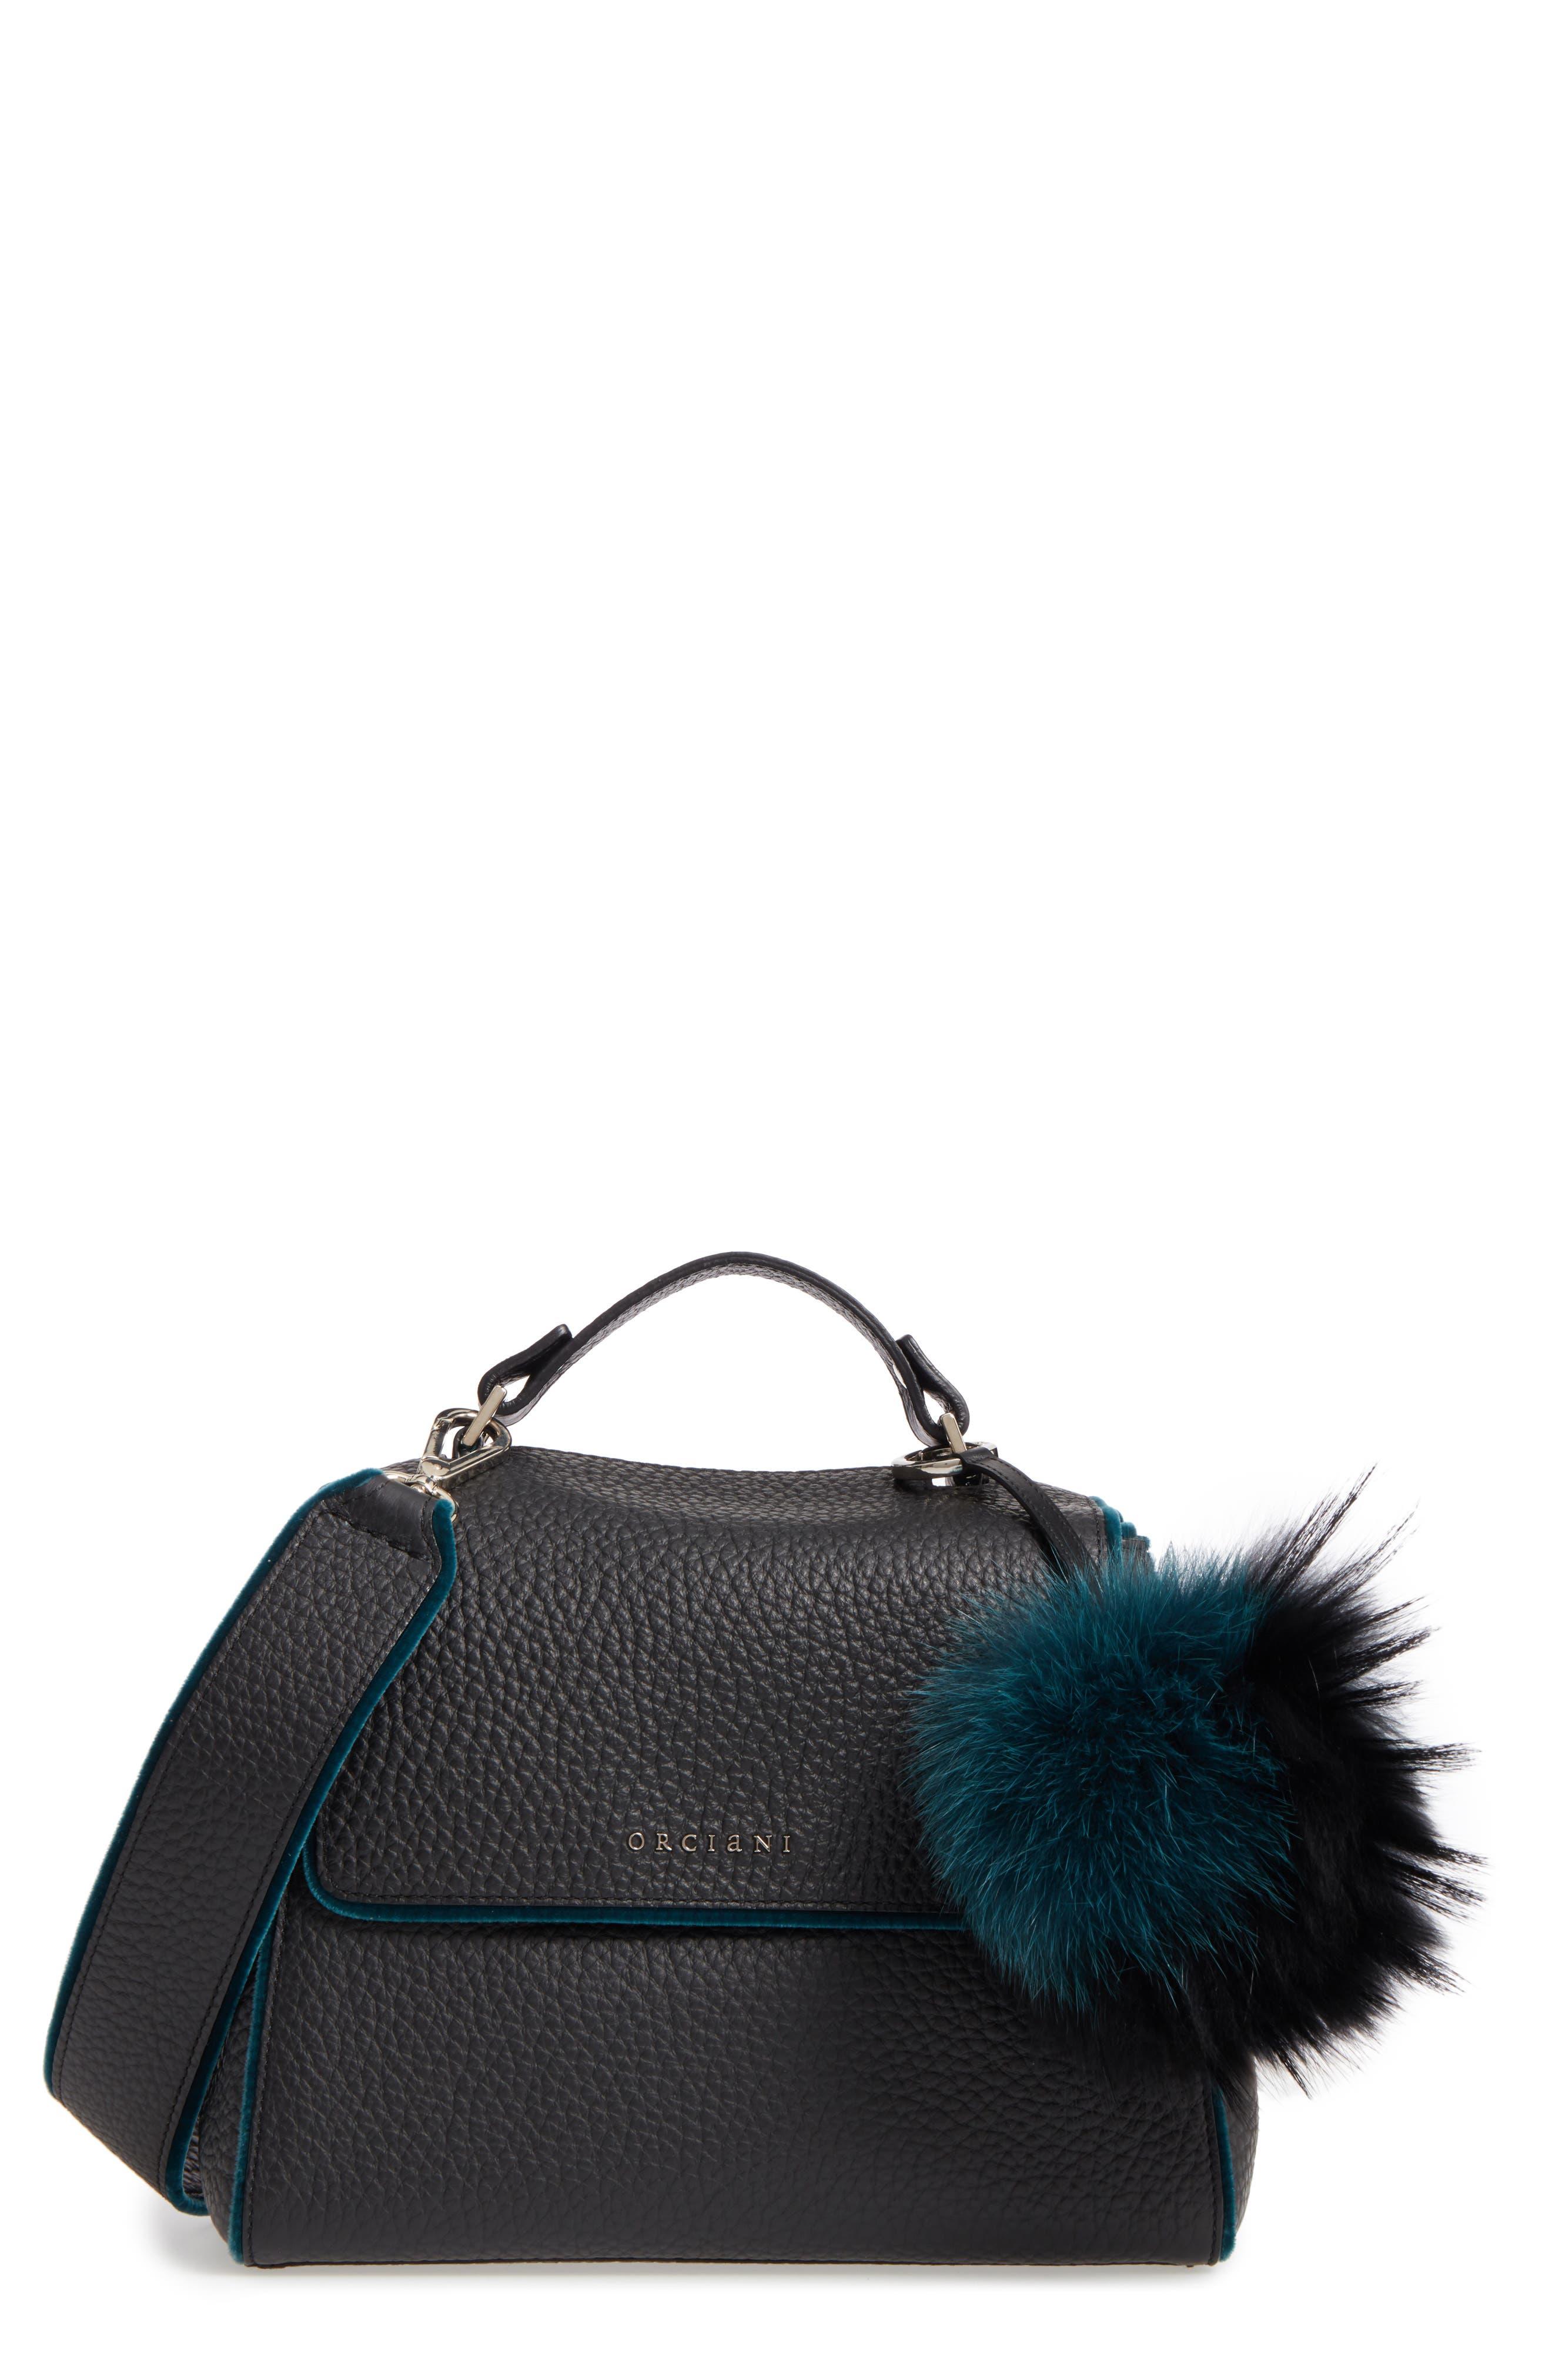 Small Sveva Soft Leather Top Handle Satchel with Genuine Fur Bag Charm,                             Main thumbnail 1, color,                             300